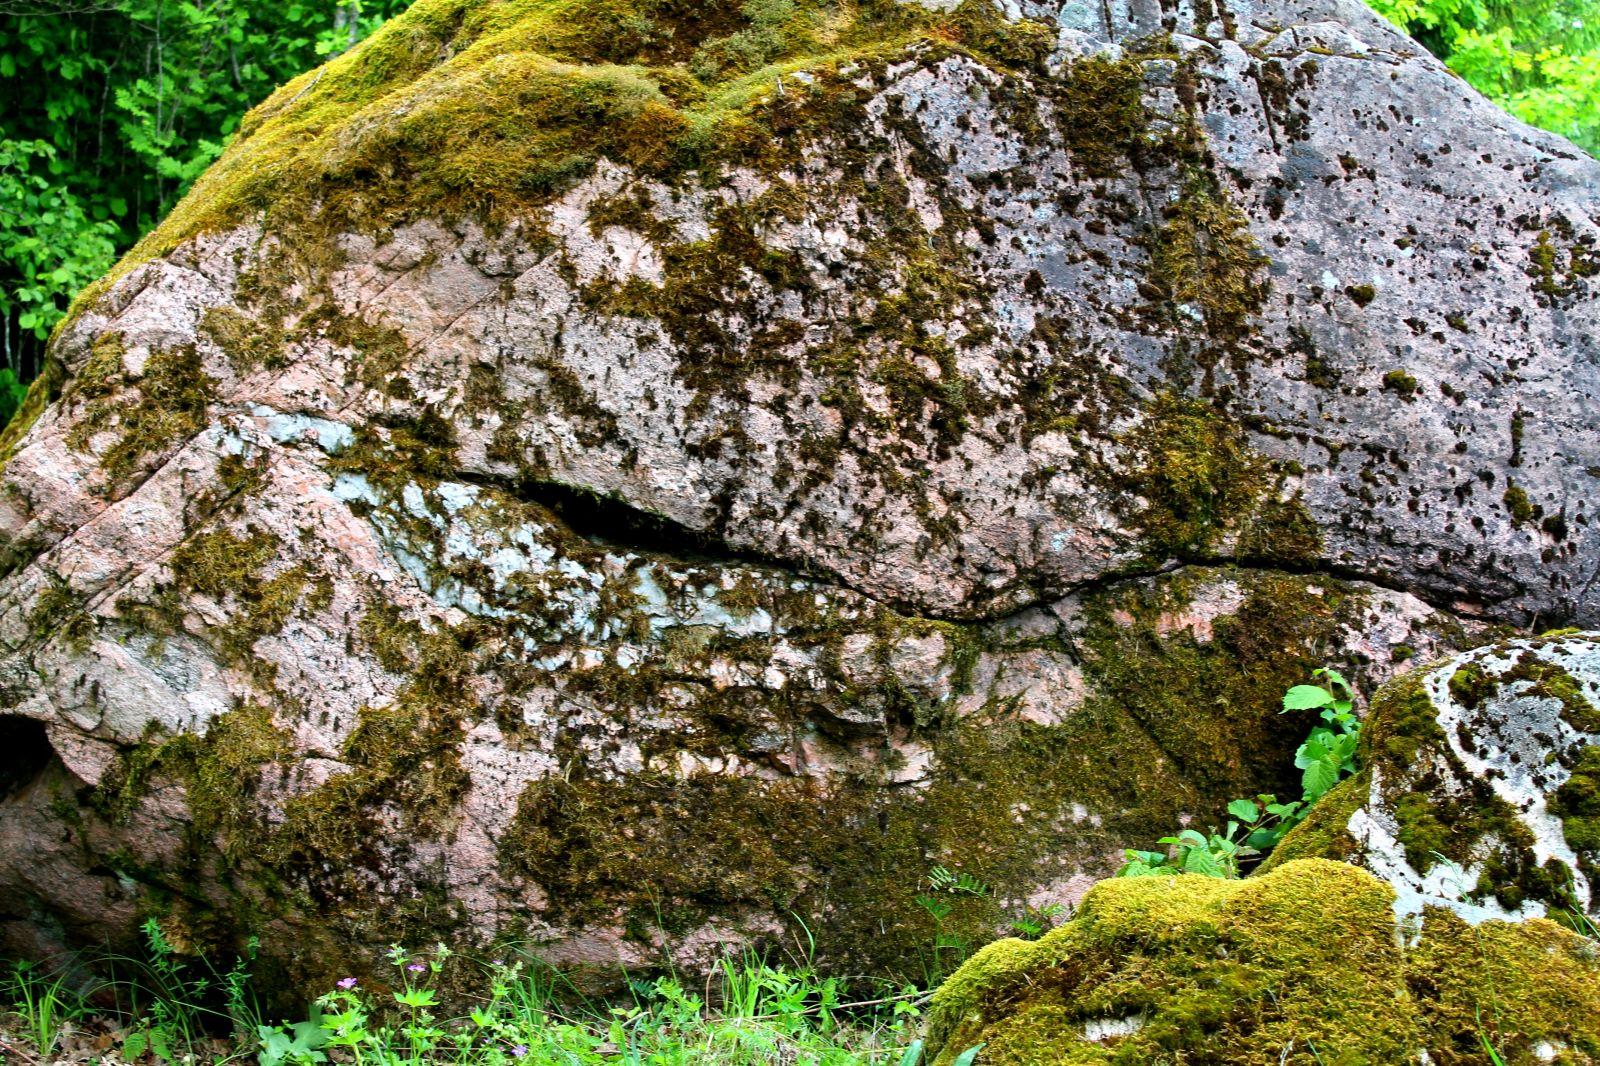 Naerev kivi